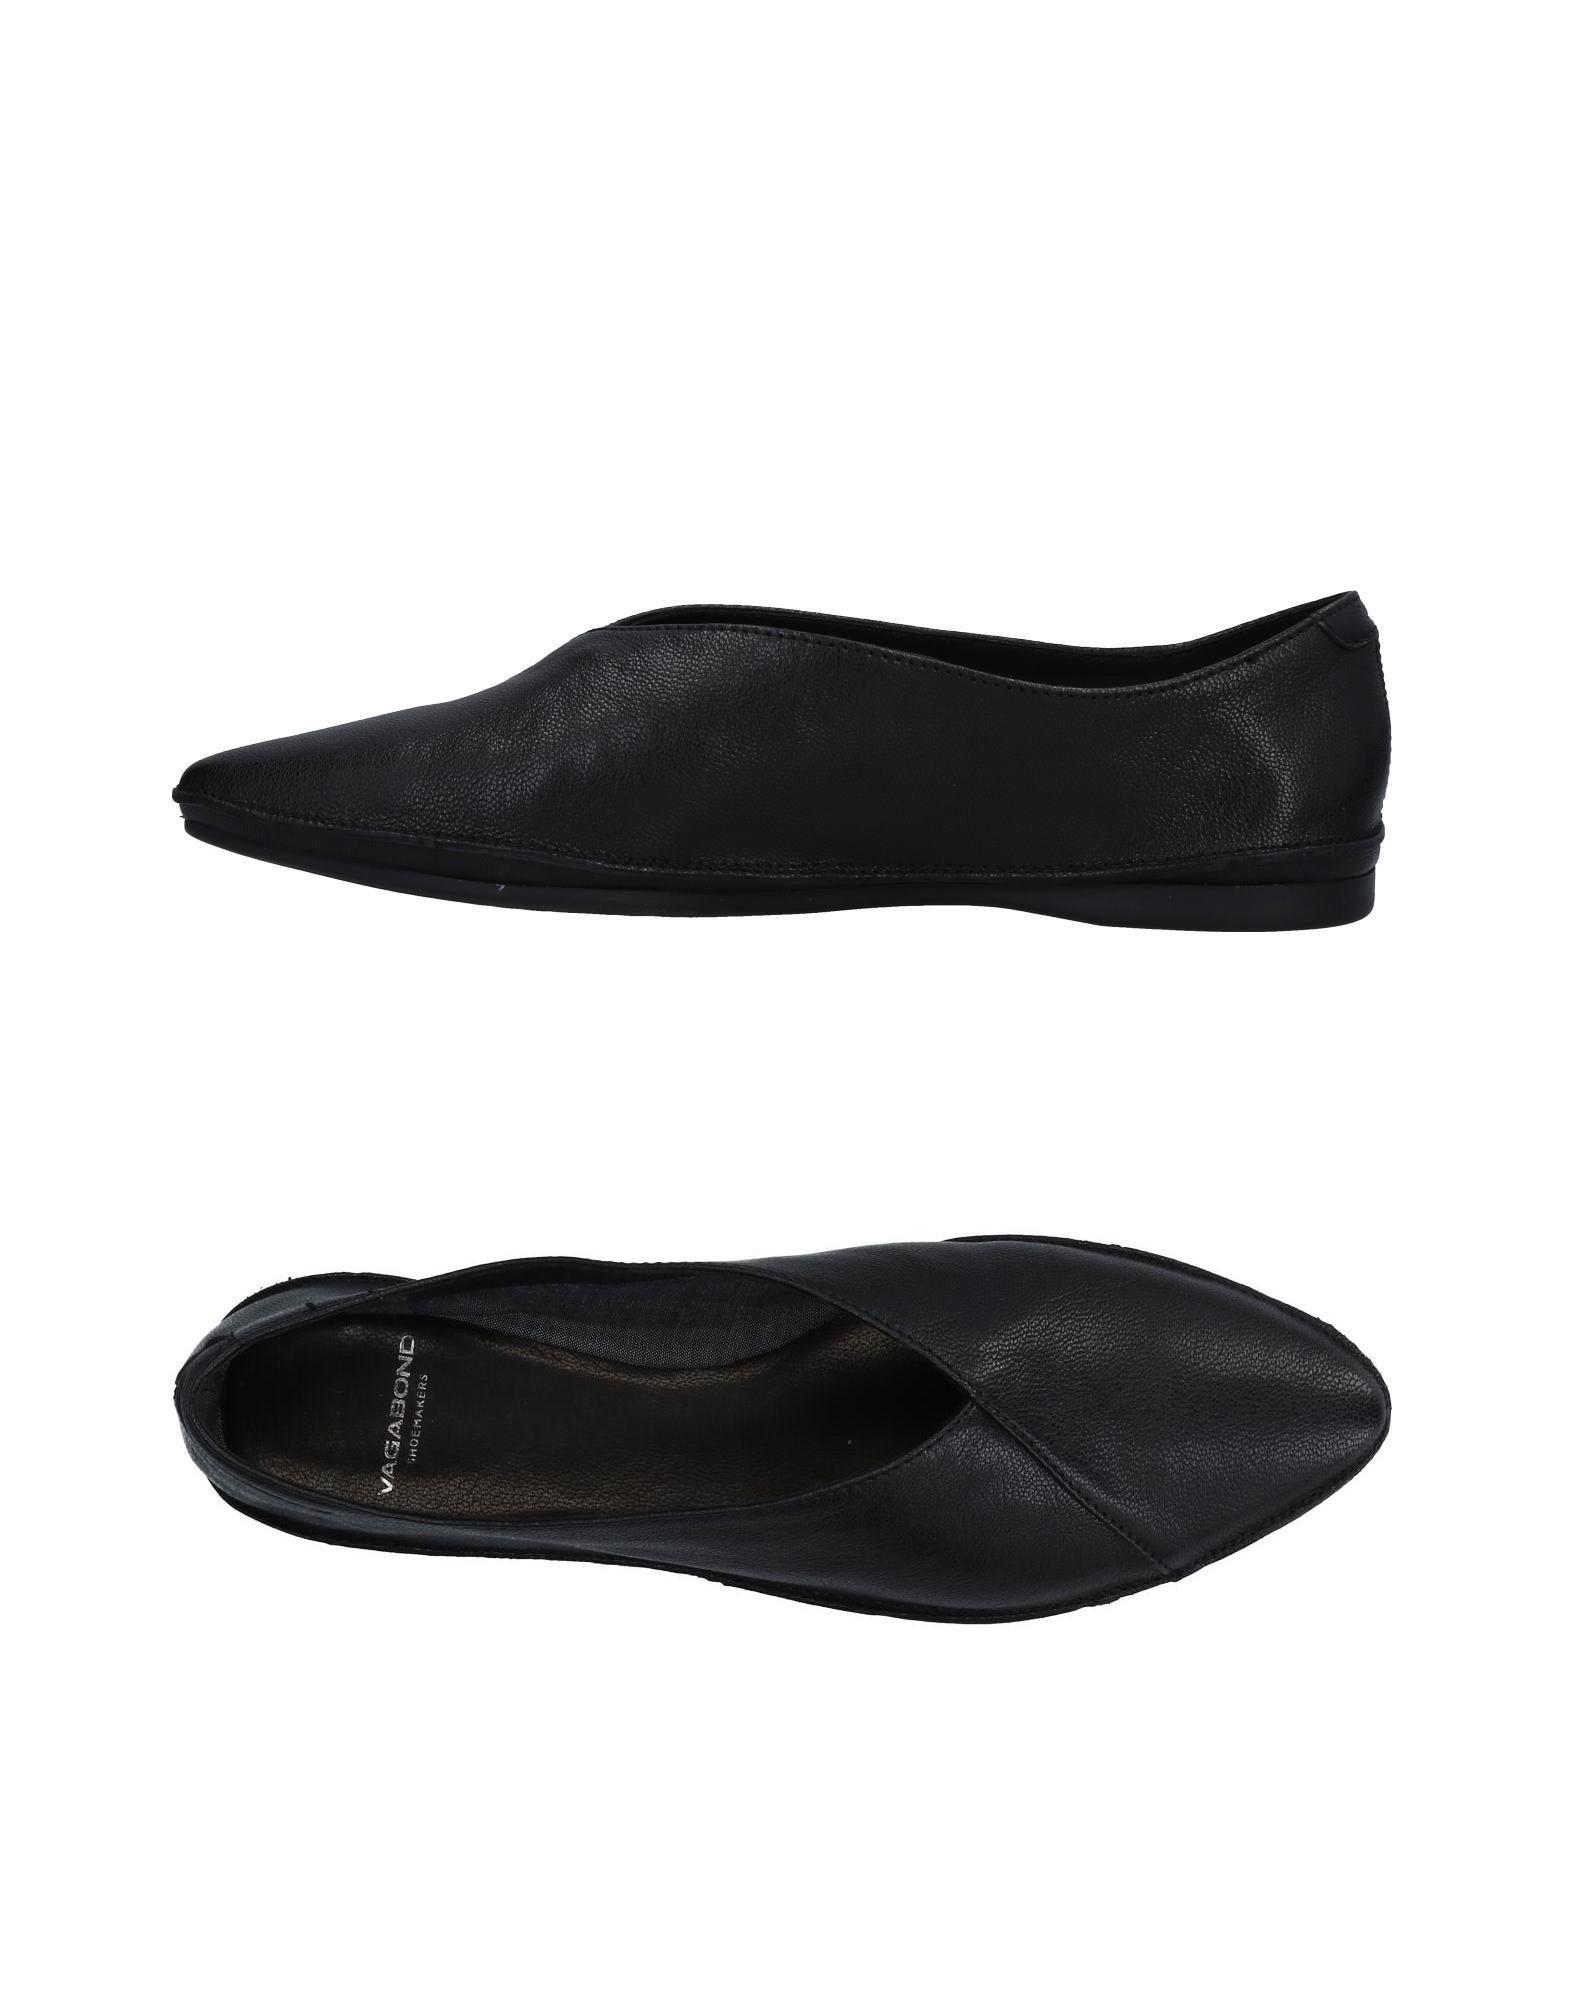 VAGABOND SHOEMAKERS Балетки vagabond shoemakers полусапоги и высокие ботинки